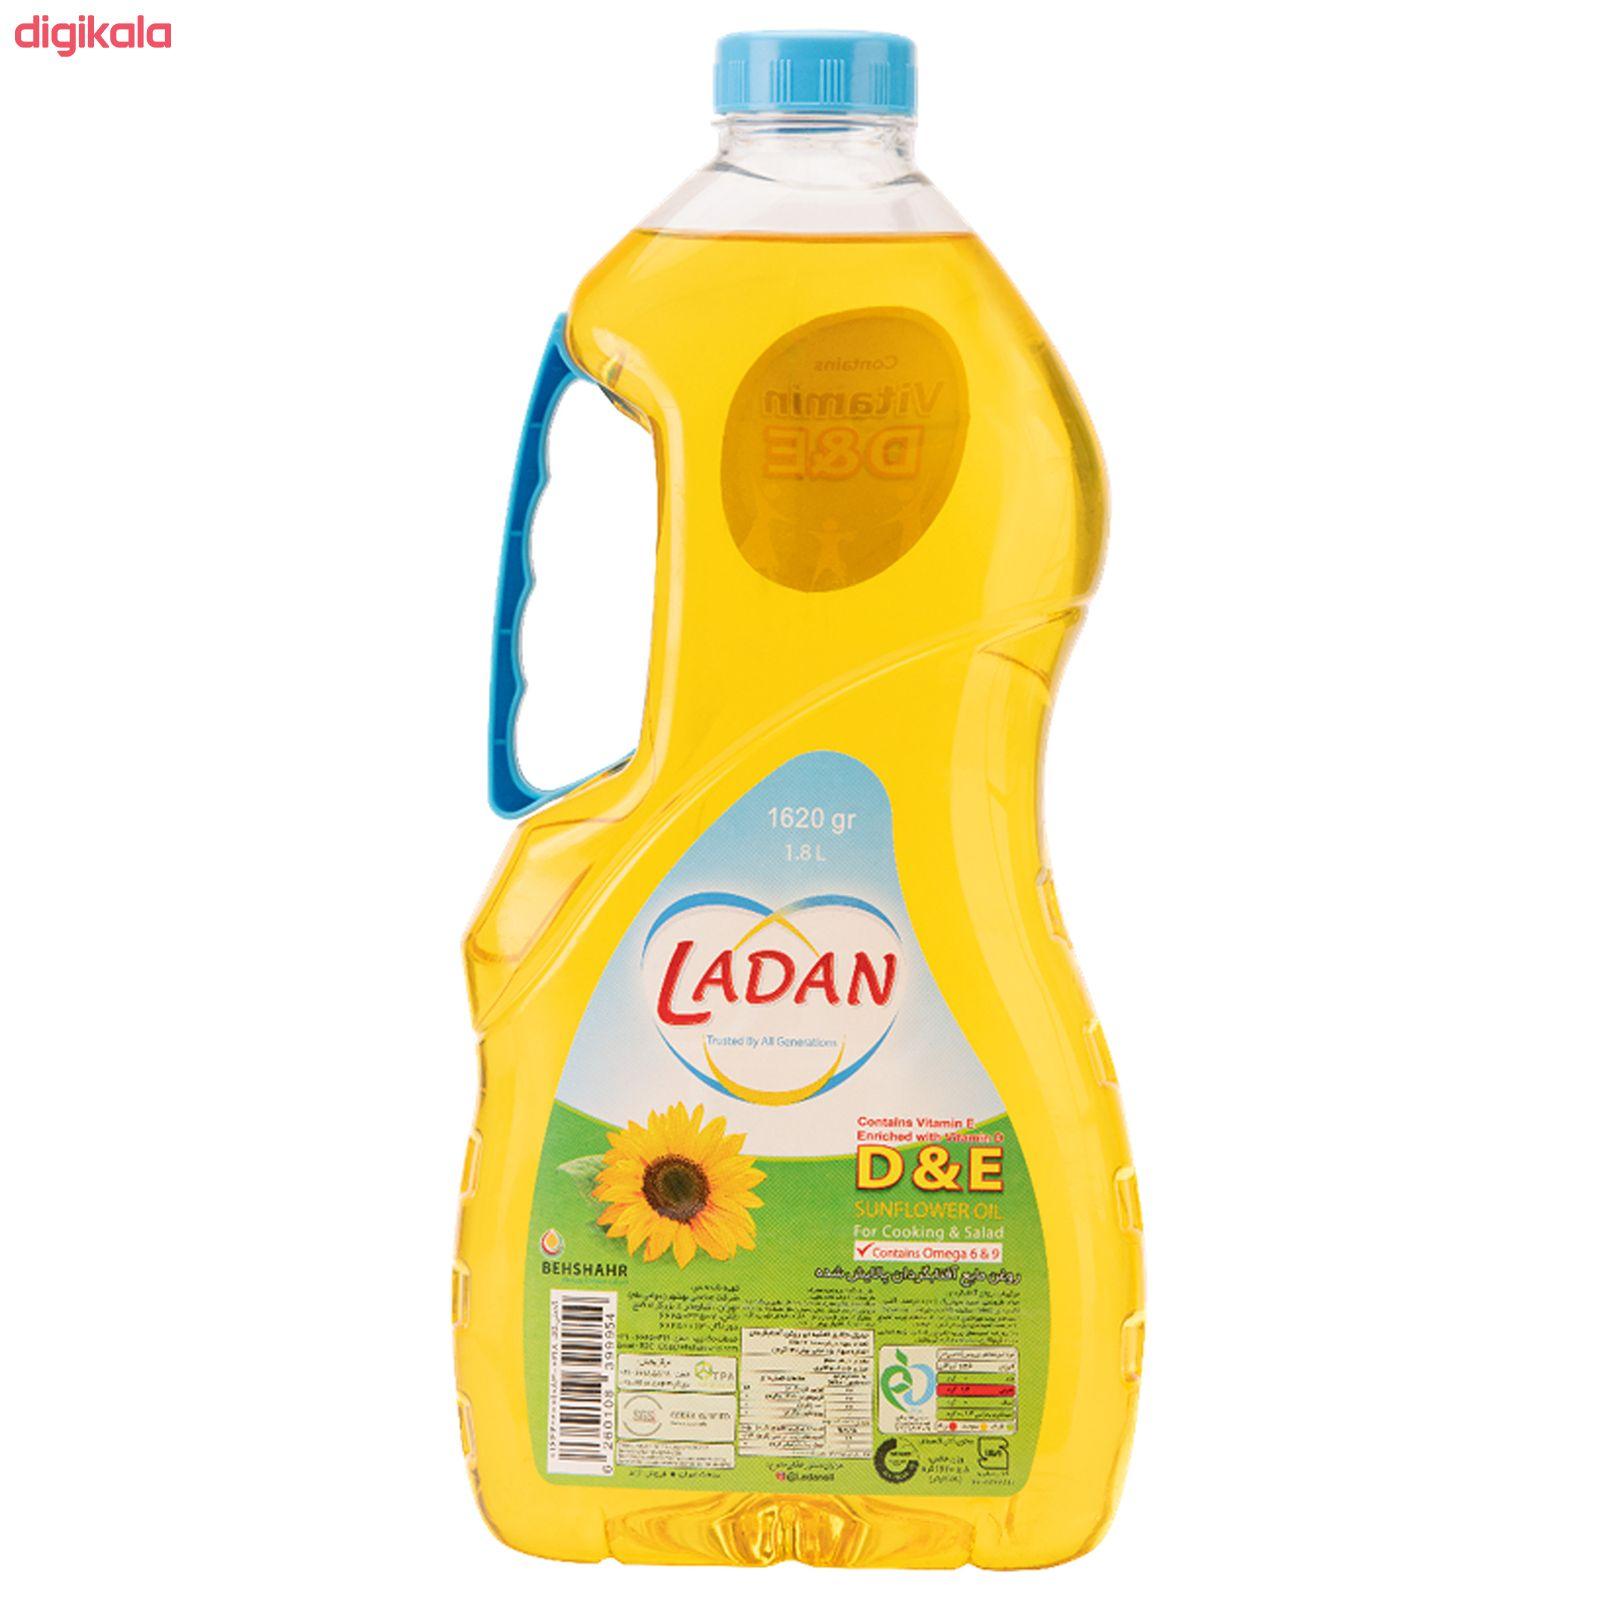 روغن مایع آفتابگردان حاوی ویتامین دی و ای لادن - 1.62  کیلوگرم main 1 3